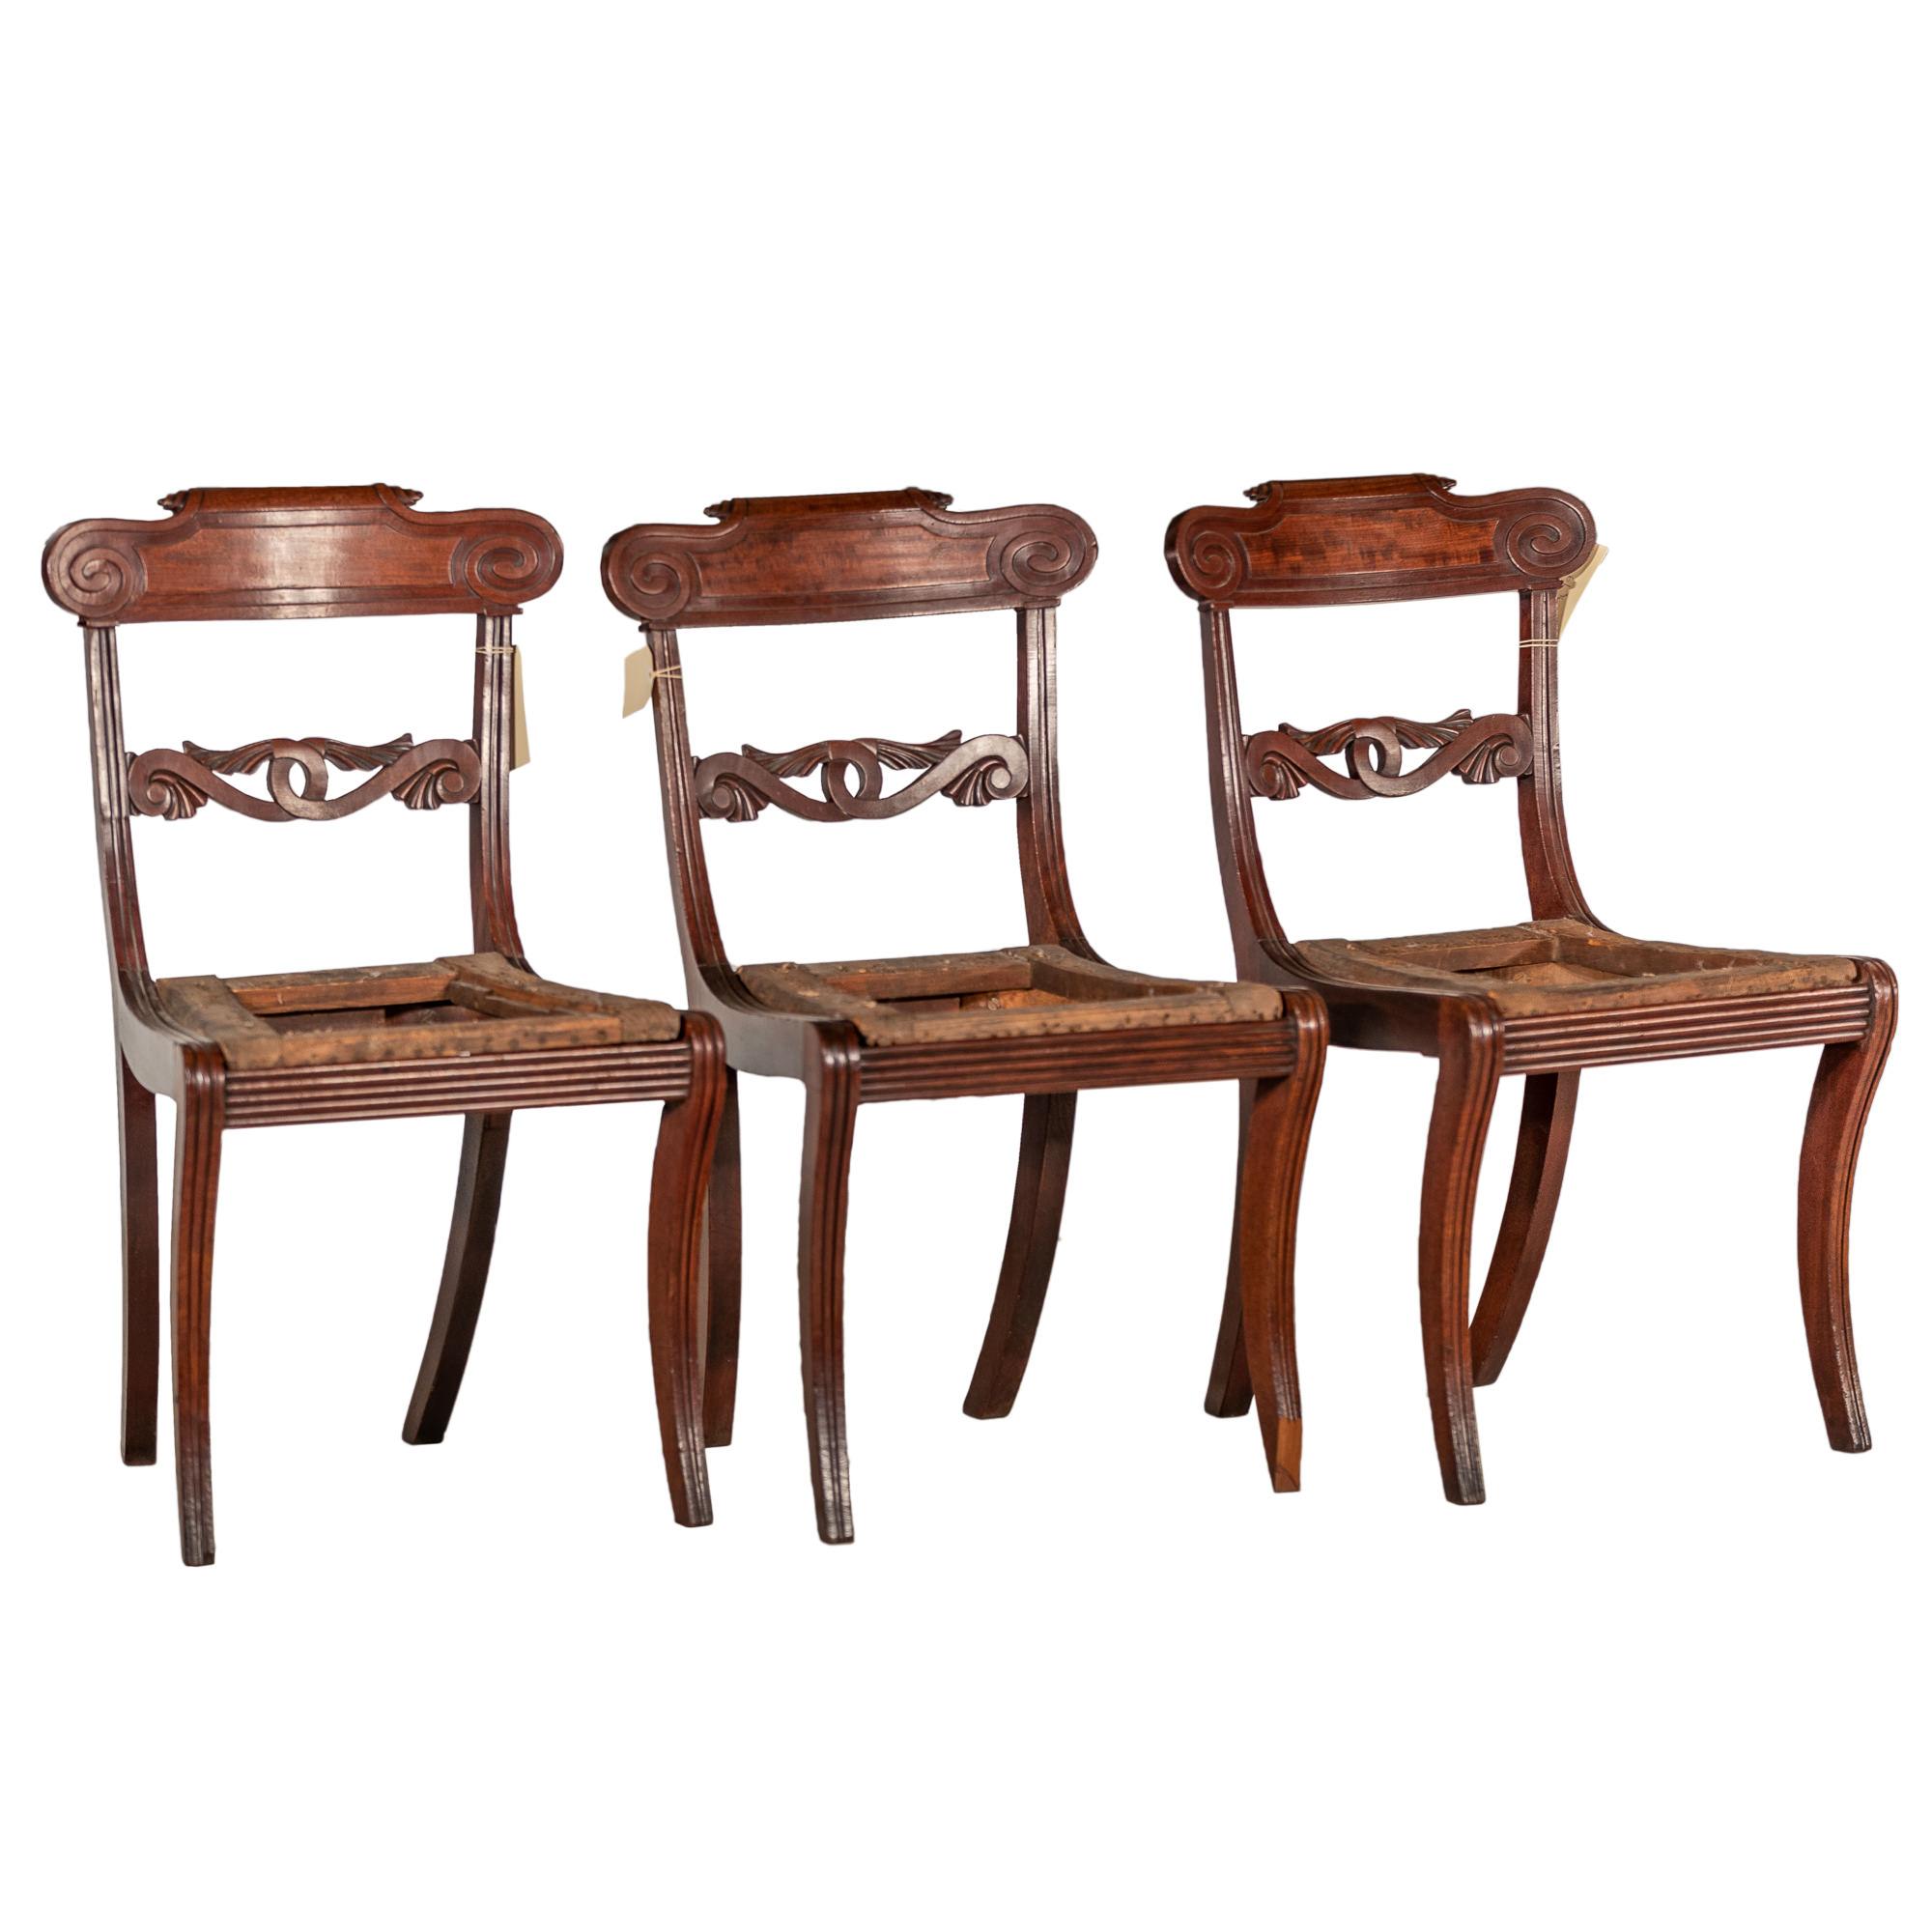 'Three Regency Period Mahogany Dining Chairs Circa 1820'